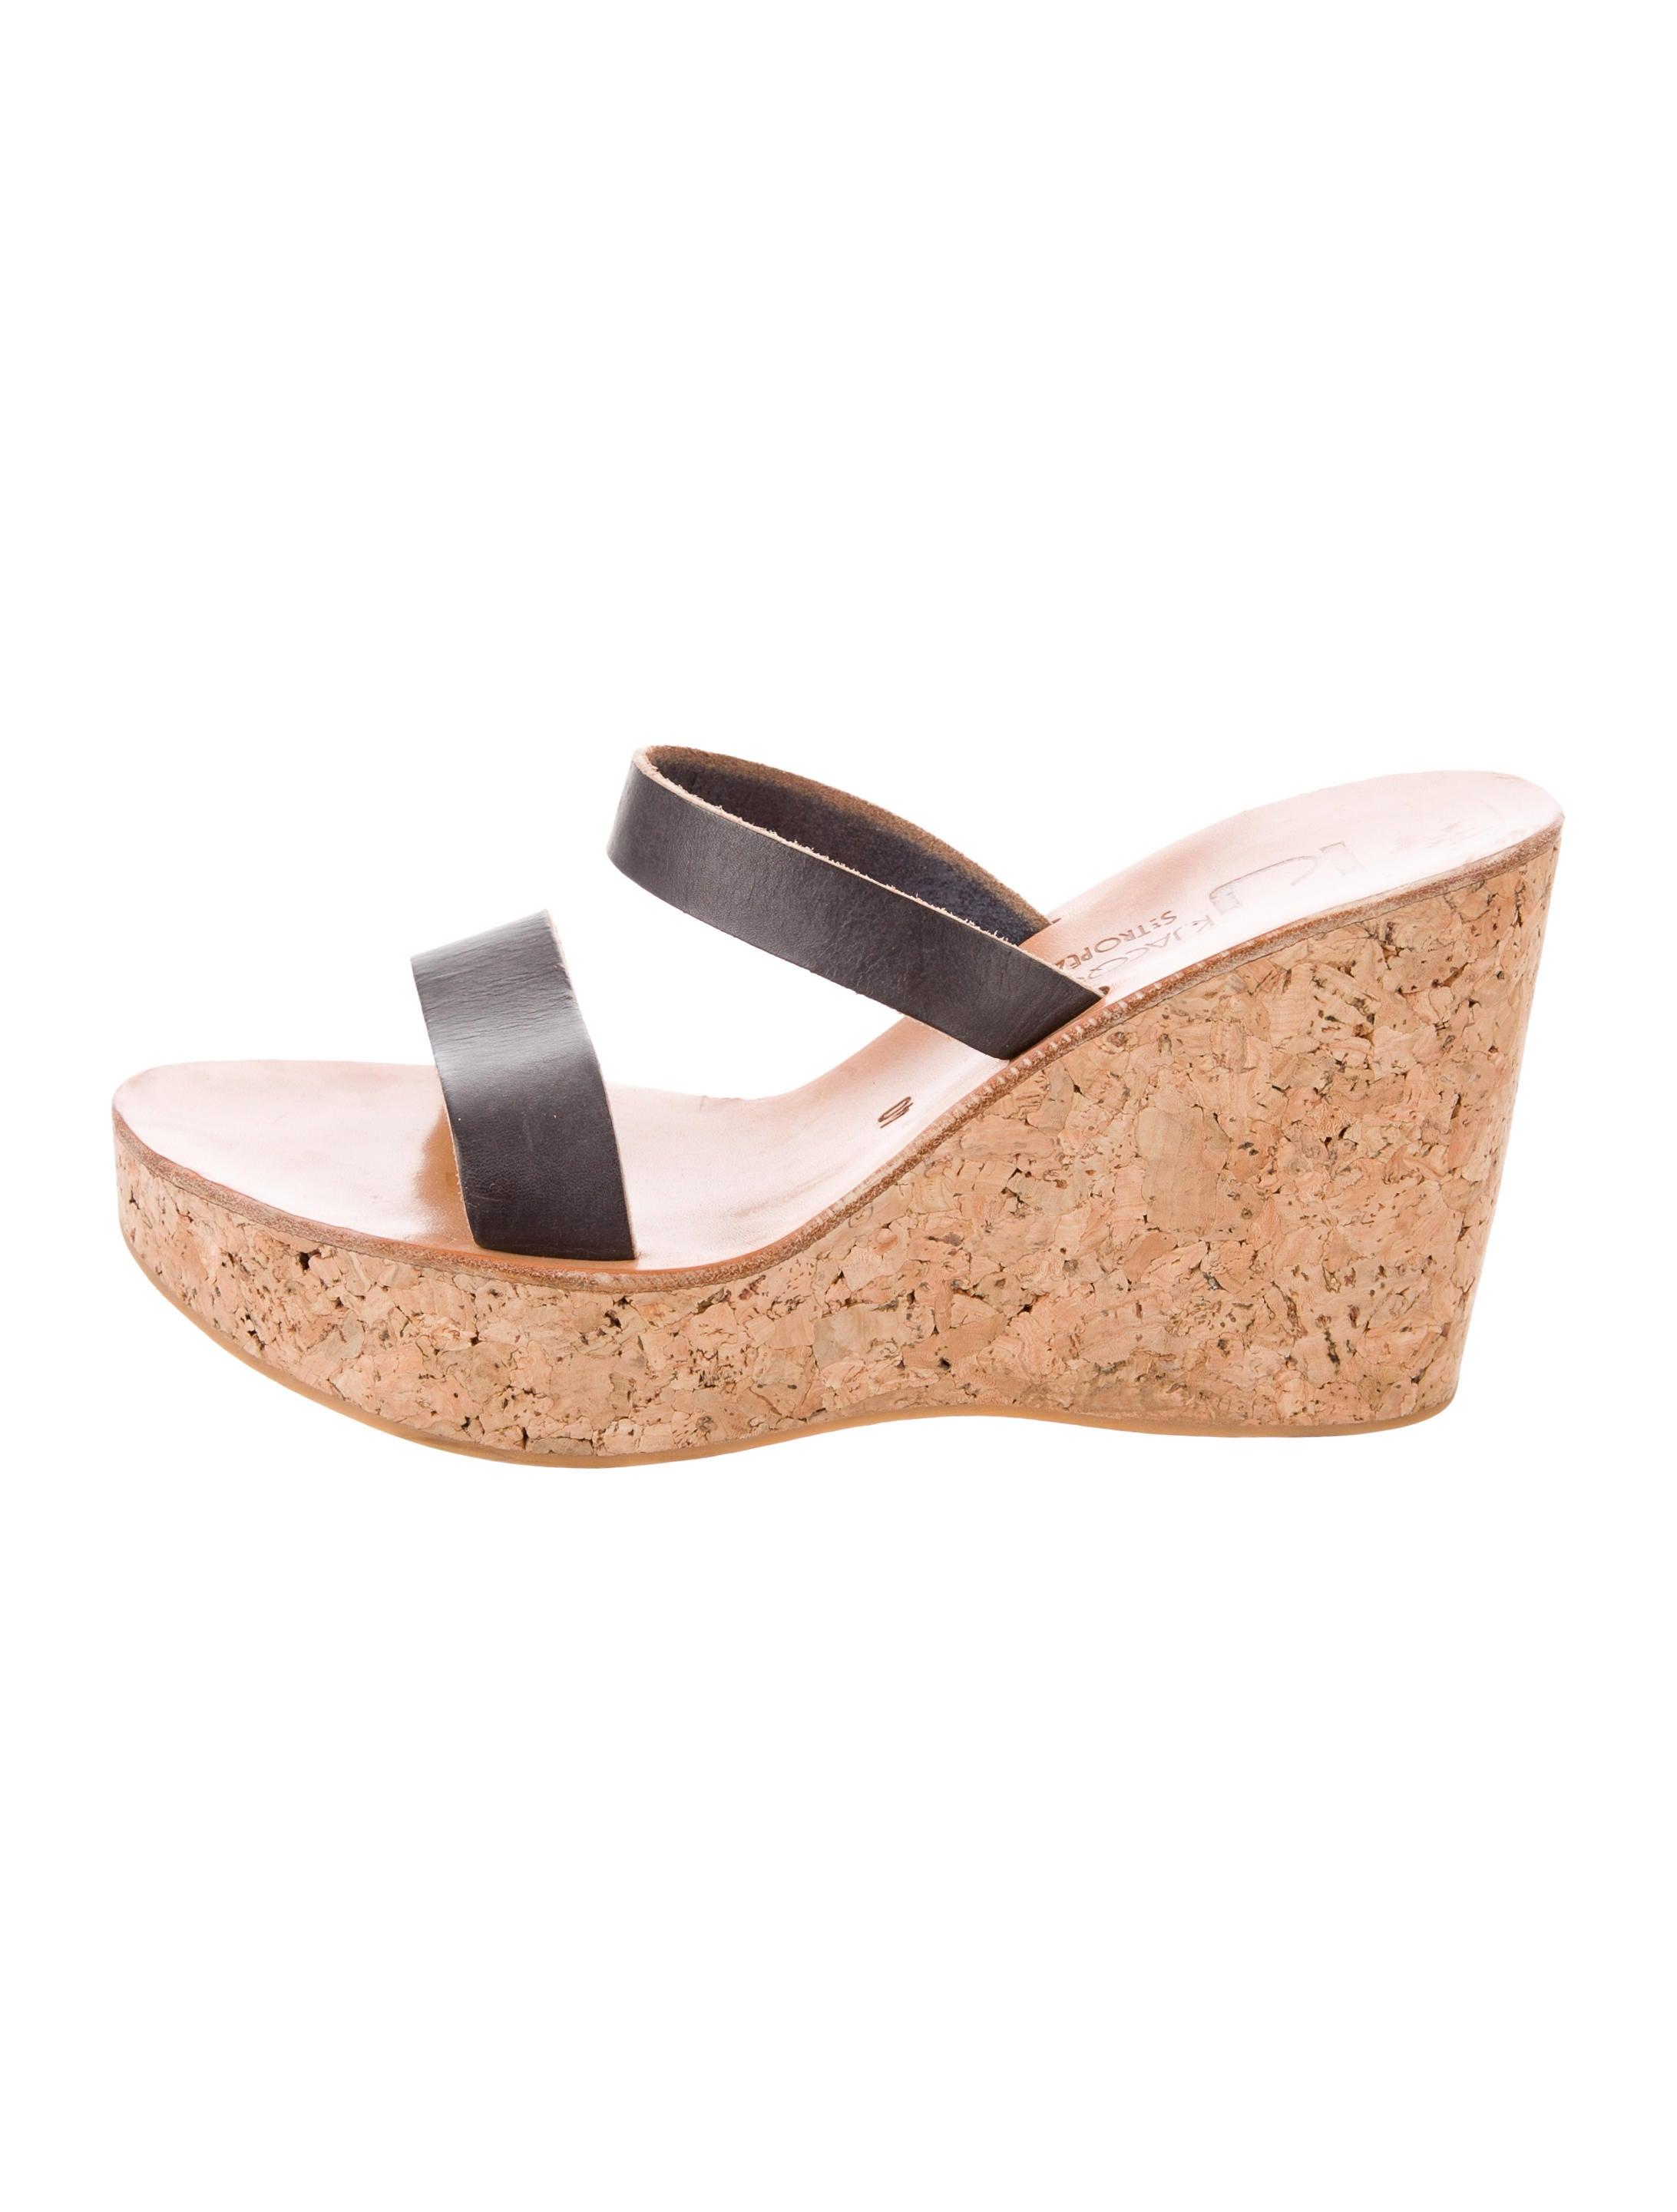 cheap excellent K Jacques St. Tropez Platform Wedge Sandals manchester great sale online 100% authentic cheap price with mastercard online PrdeoG19SS